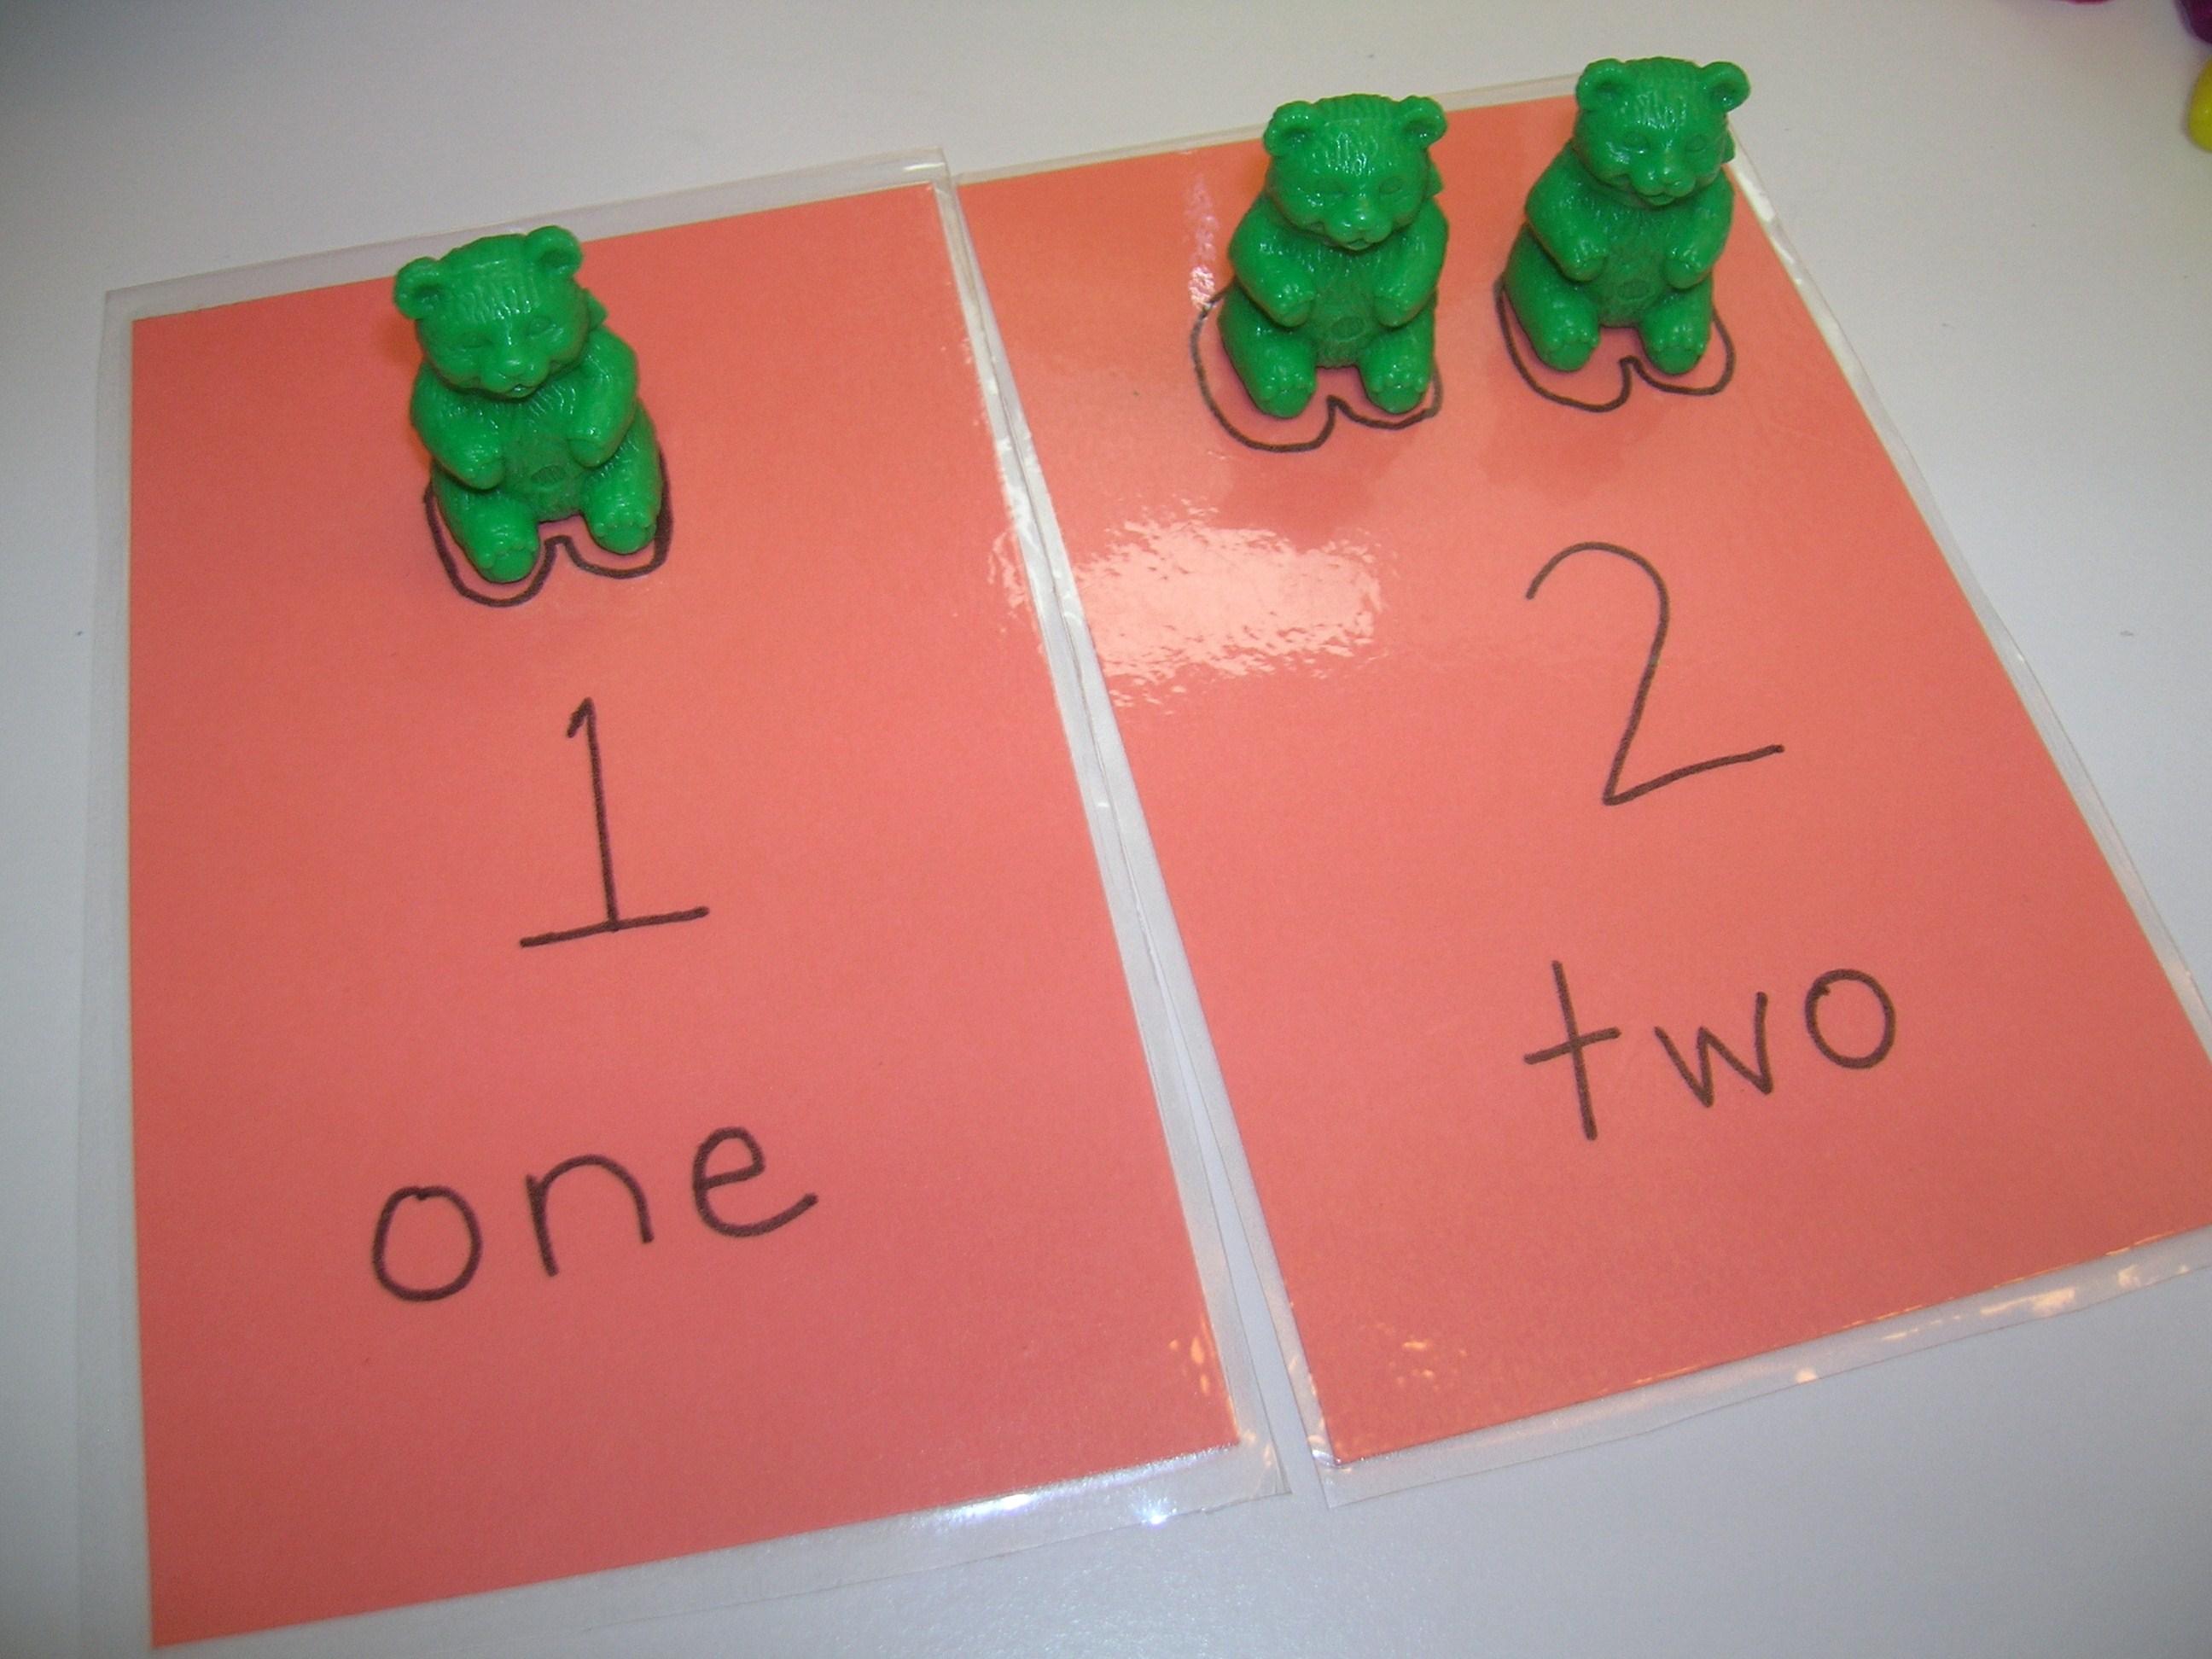 1 6 Cognitive Development Thinking Skills